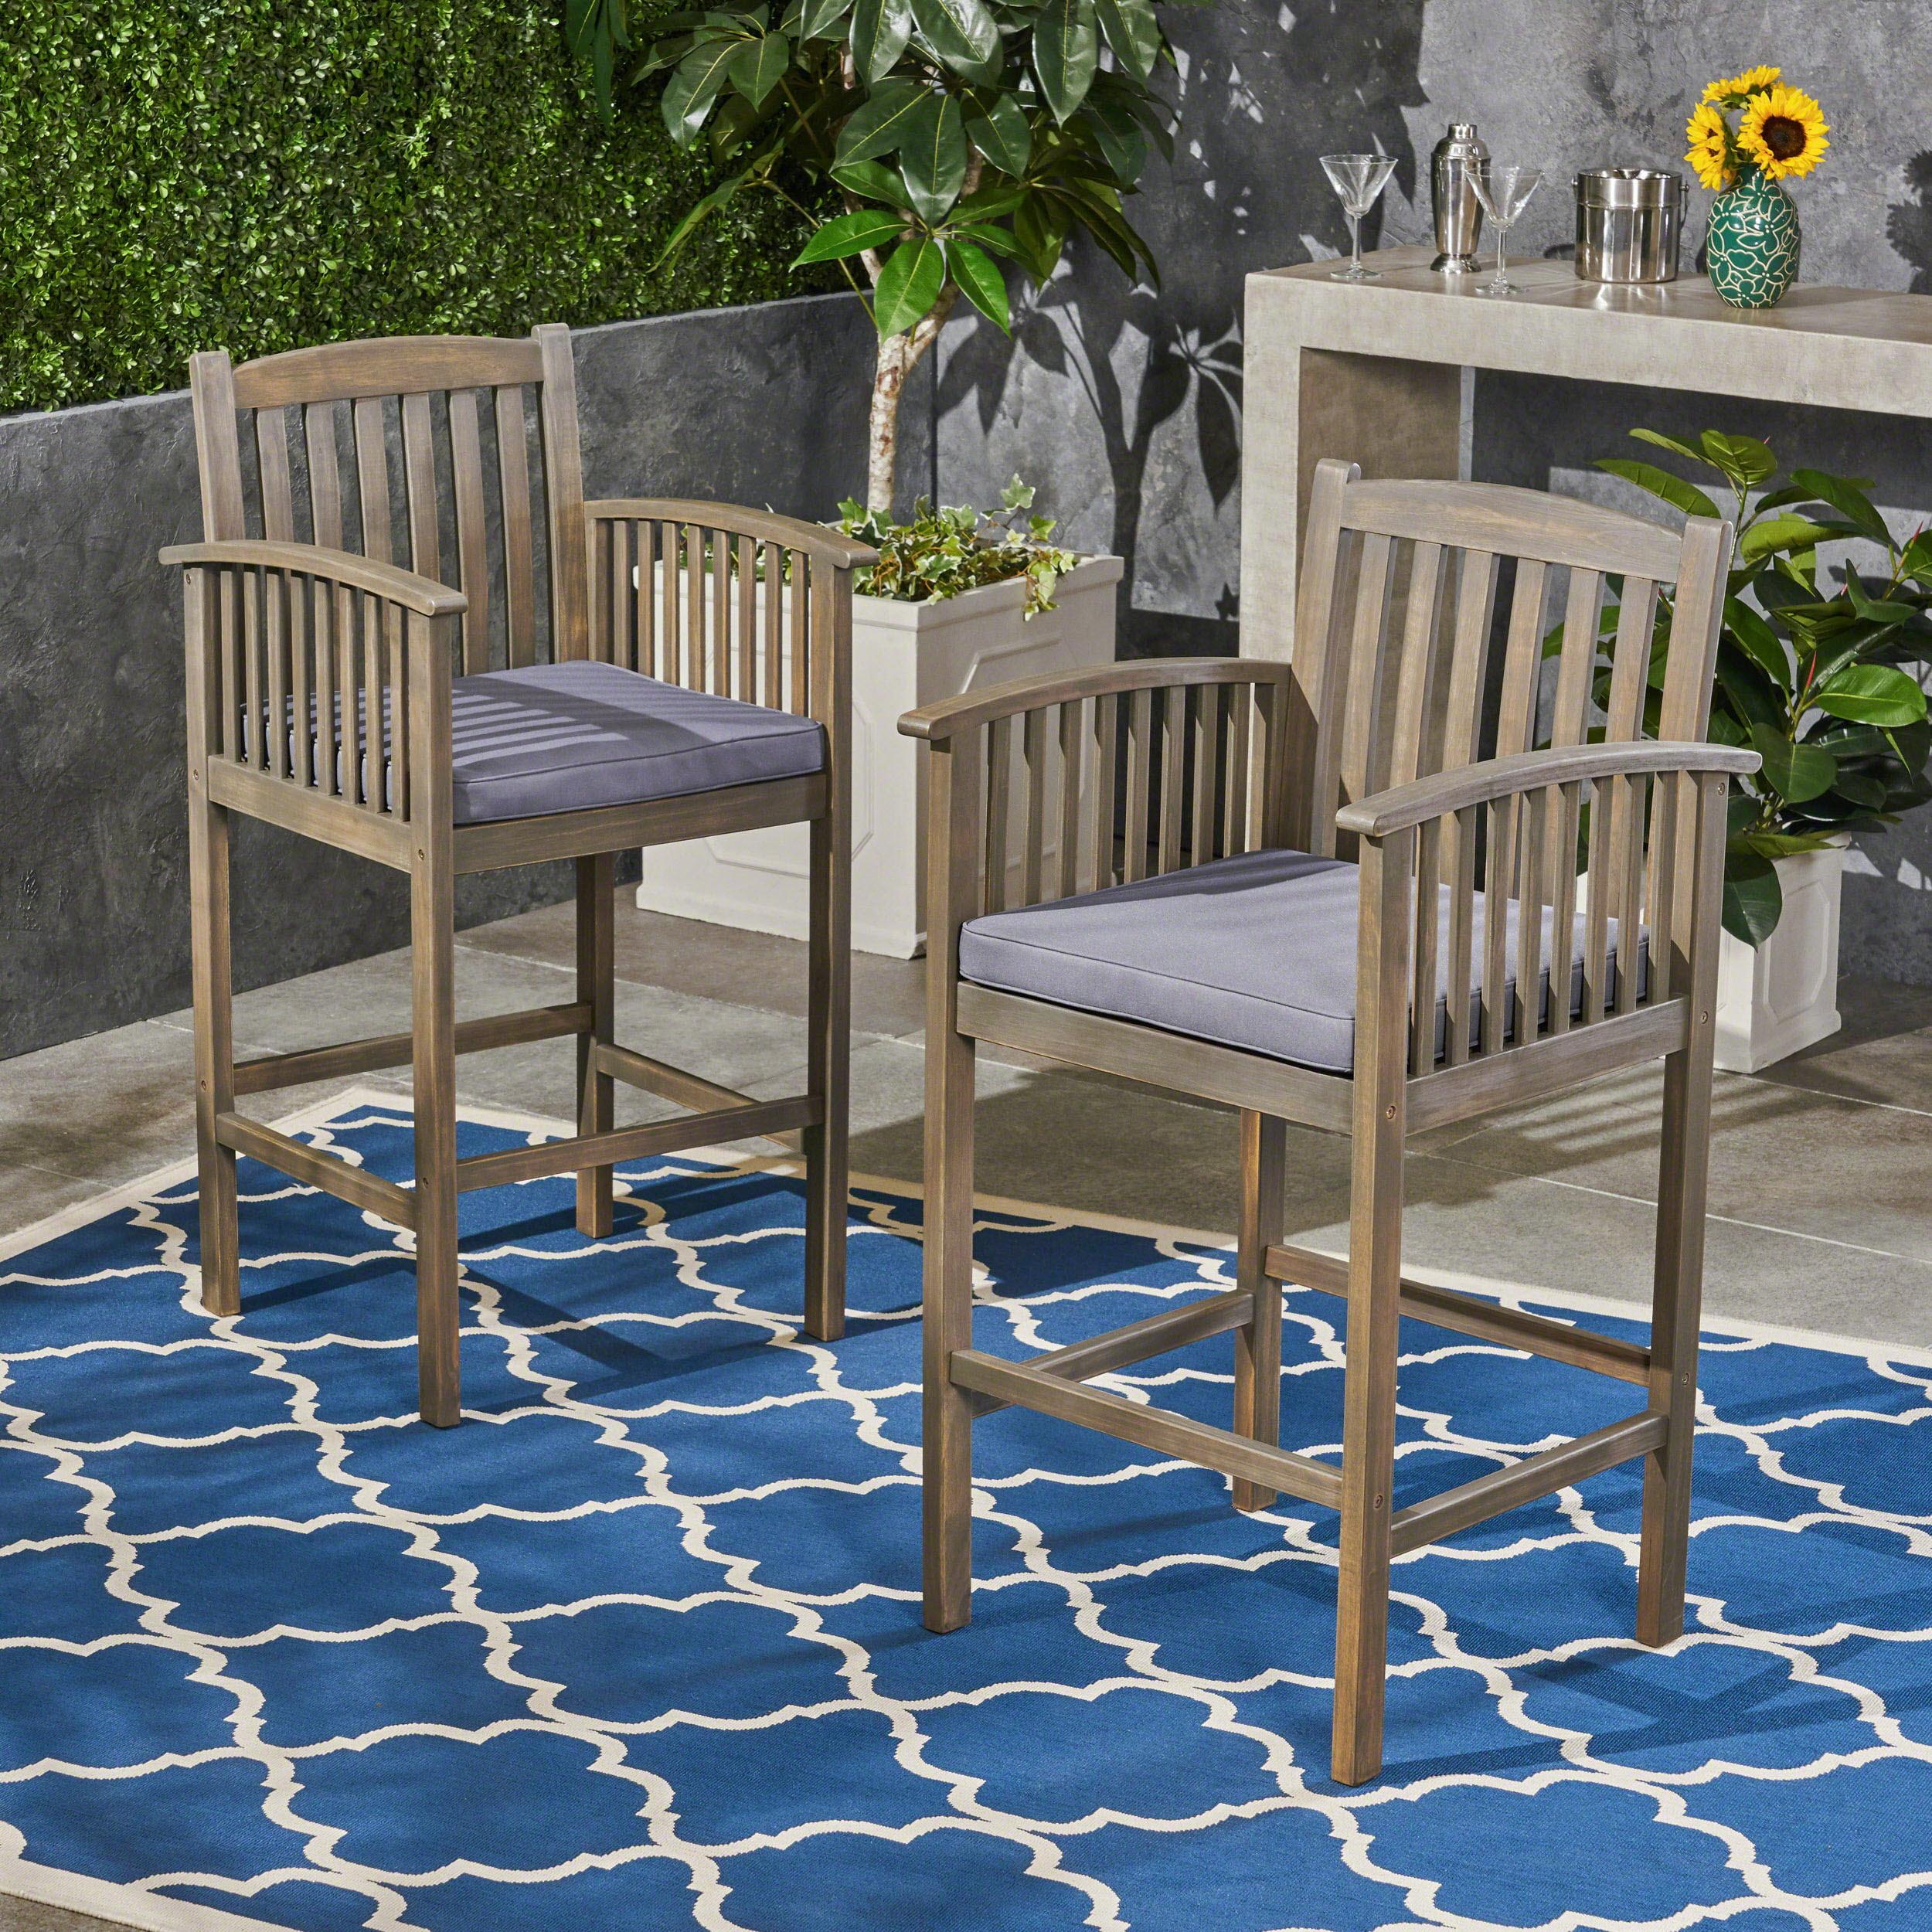 Frederic Outdoor Acacia Wood Bar Stools with Cushions, Set of 2, Natural, Cream